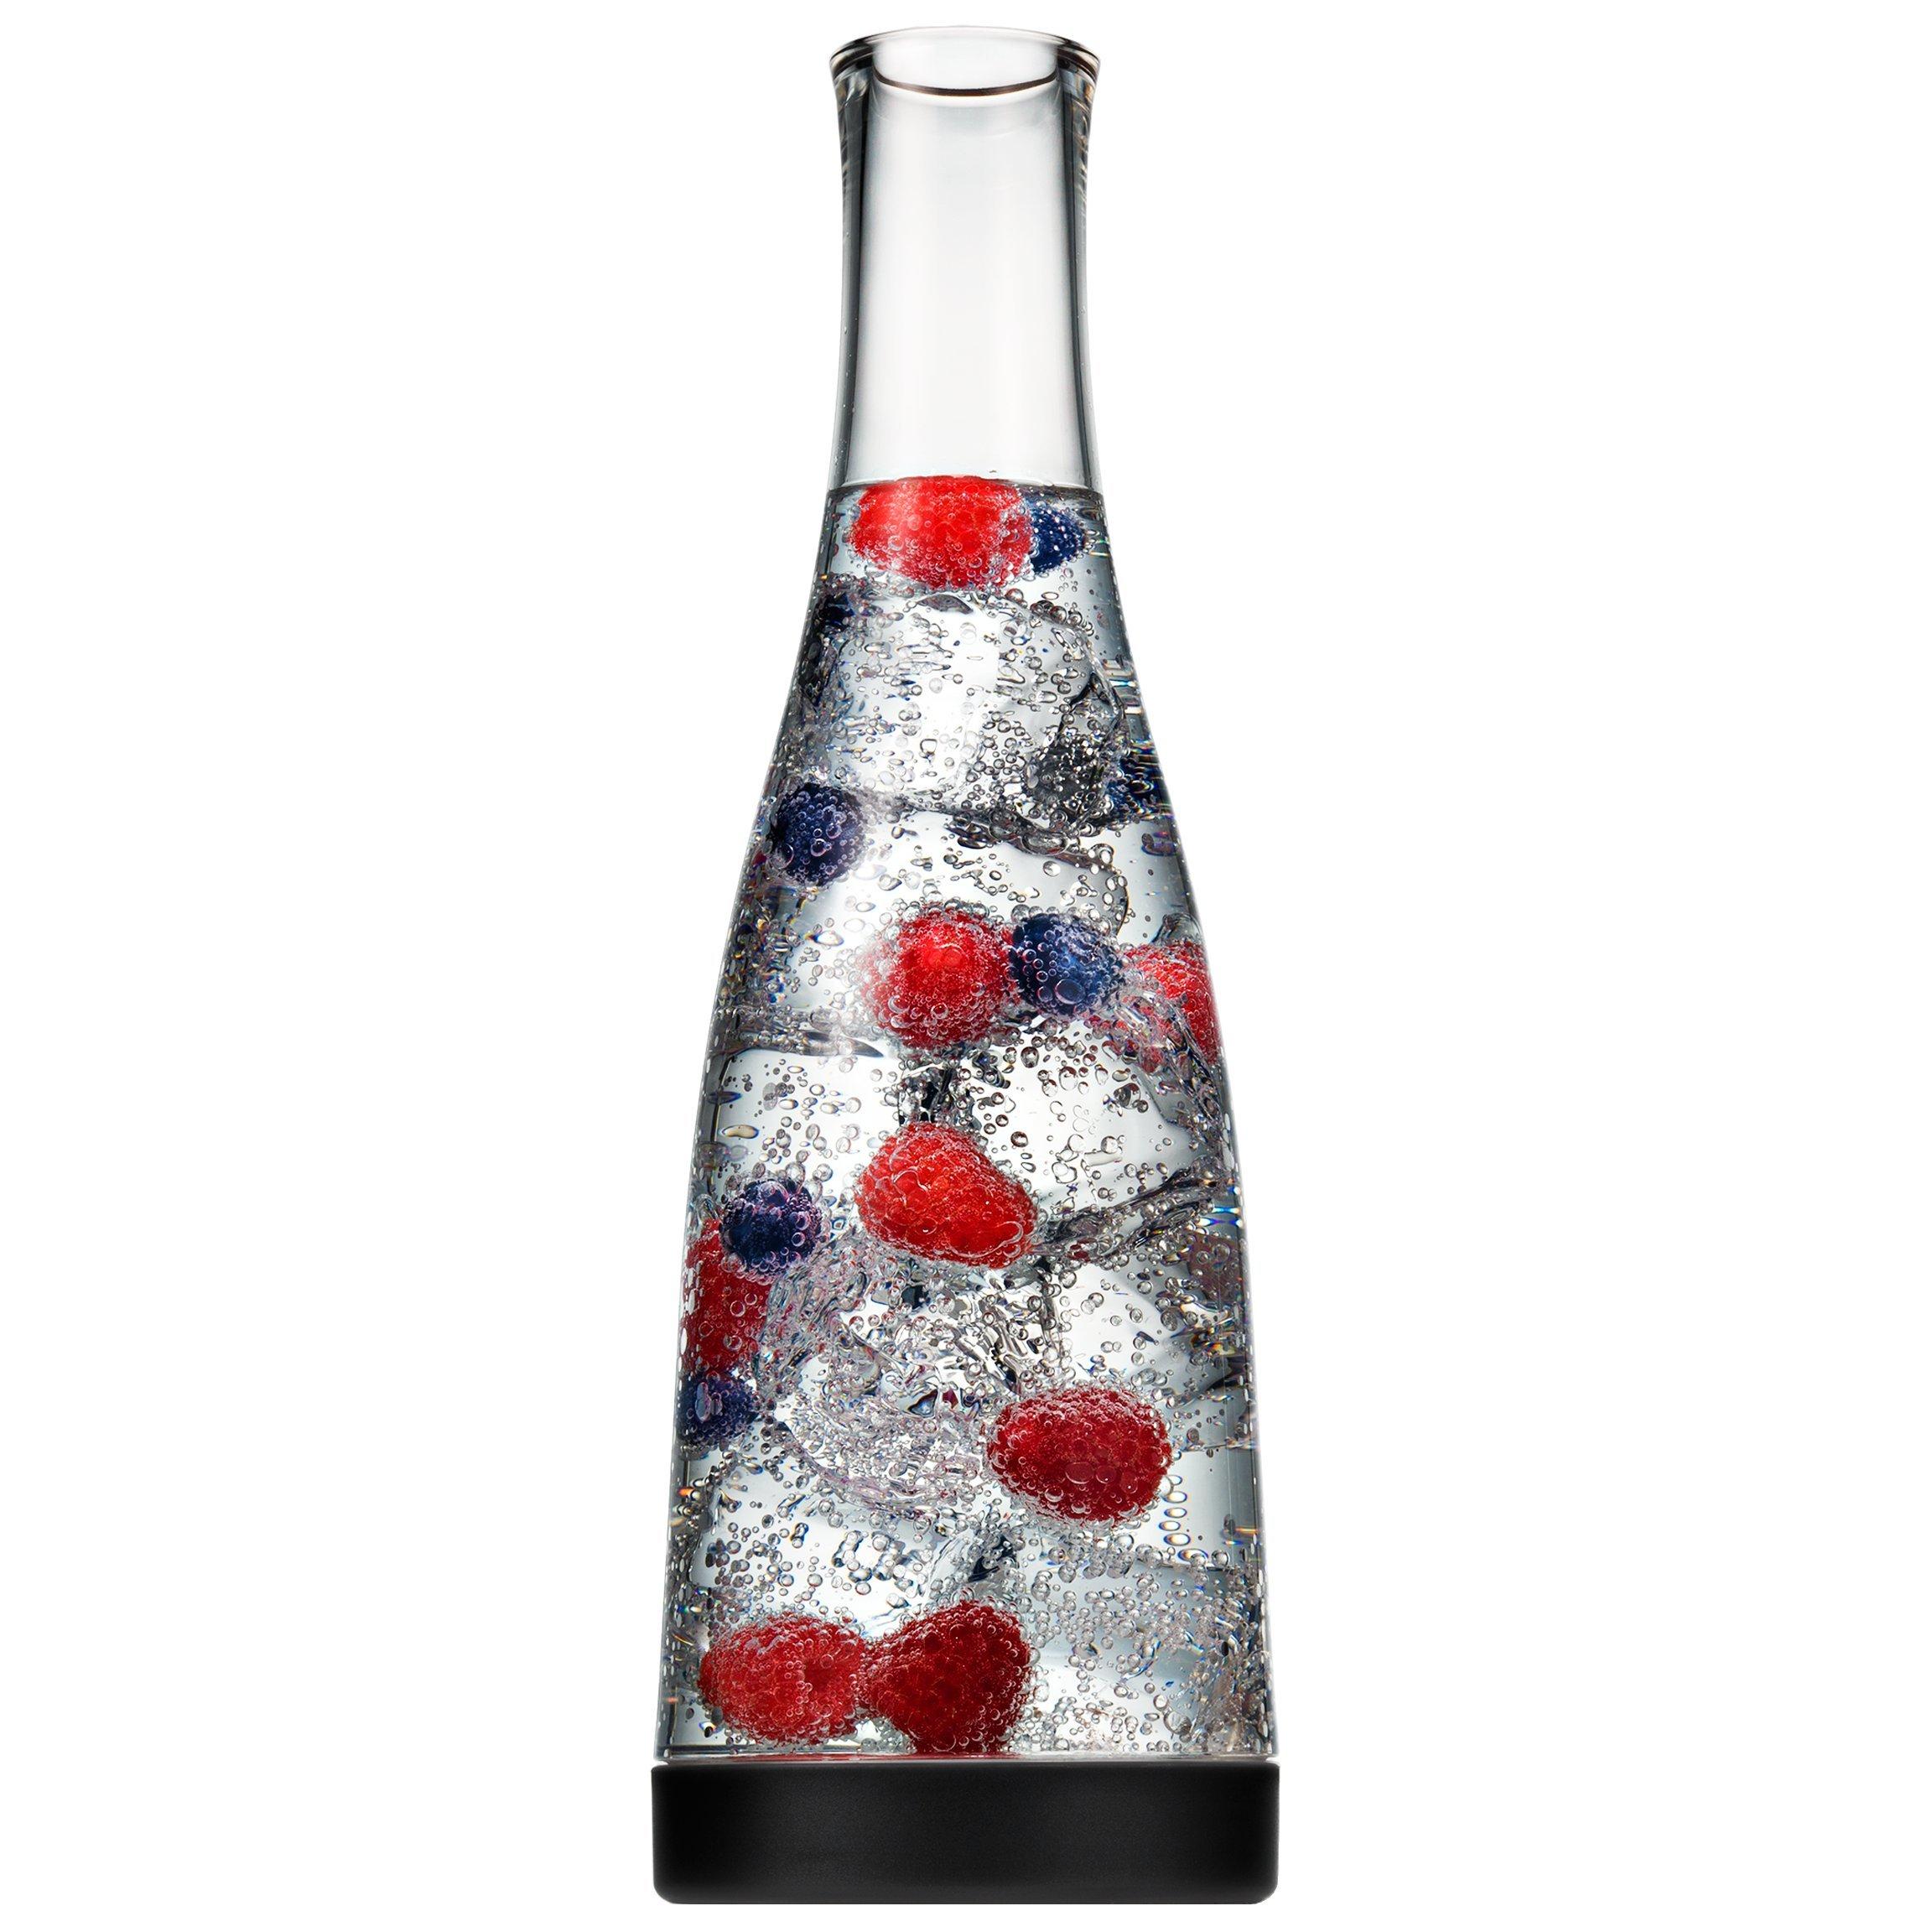 Drinique SRV-CA-CLR-12 Beverage Service Easy Clean Carafe Decanter, 32 oz (Case of 12), Clear by Drinique (Image #3)